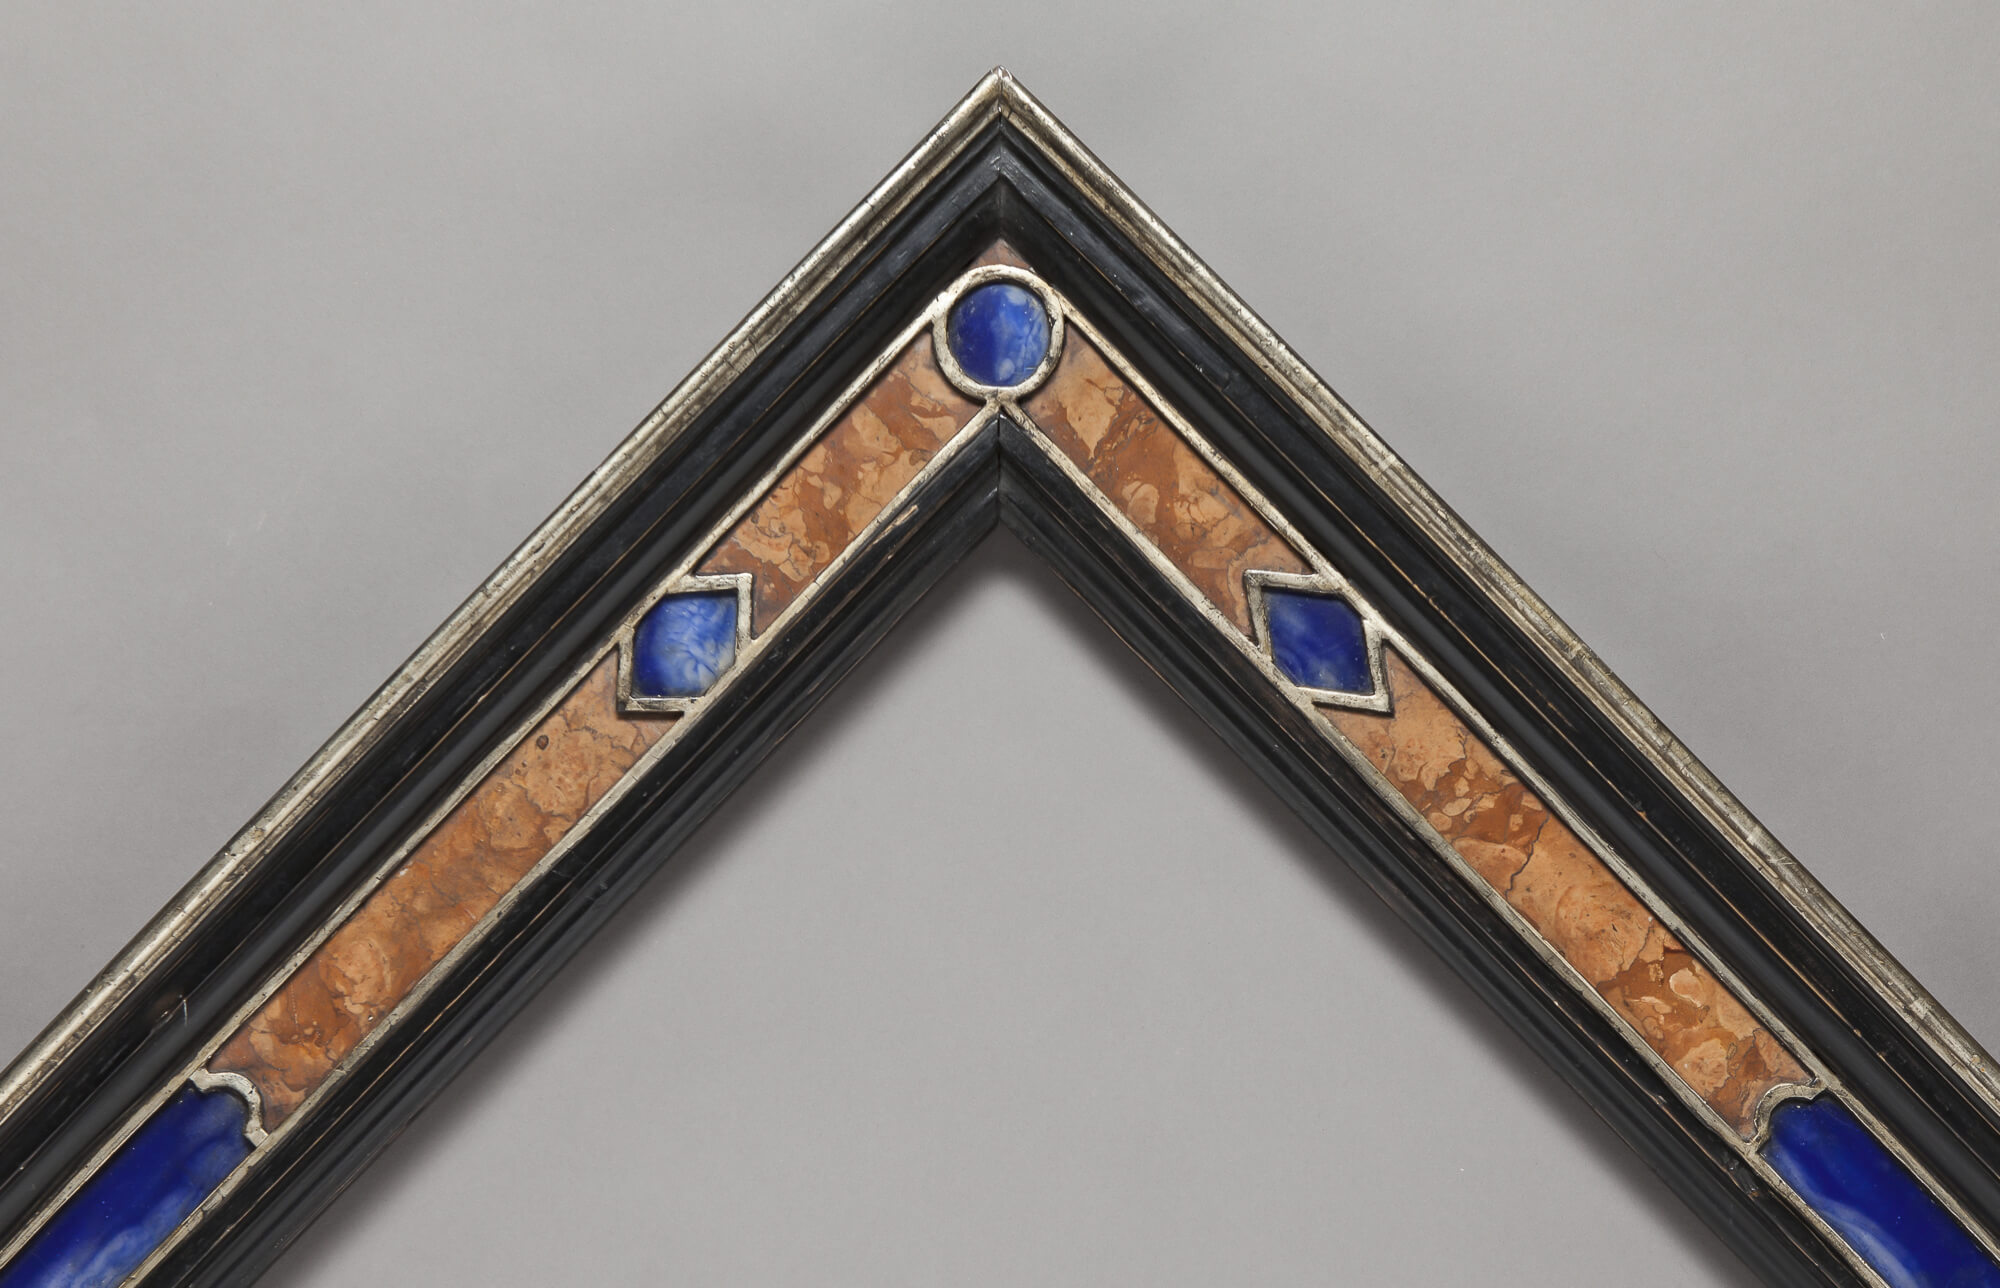 18th Century Cassetta with precious stones